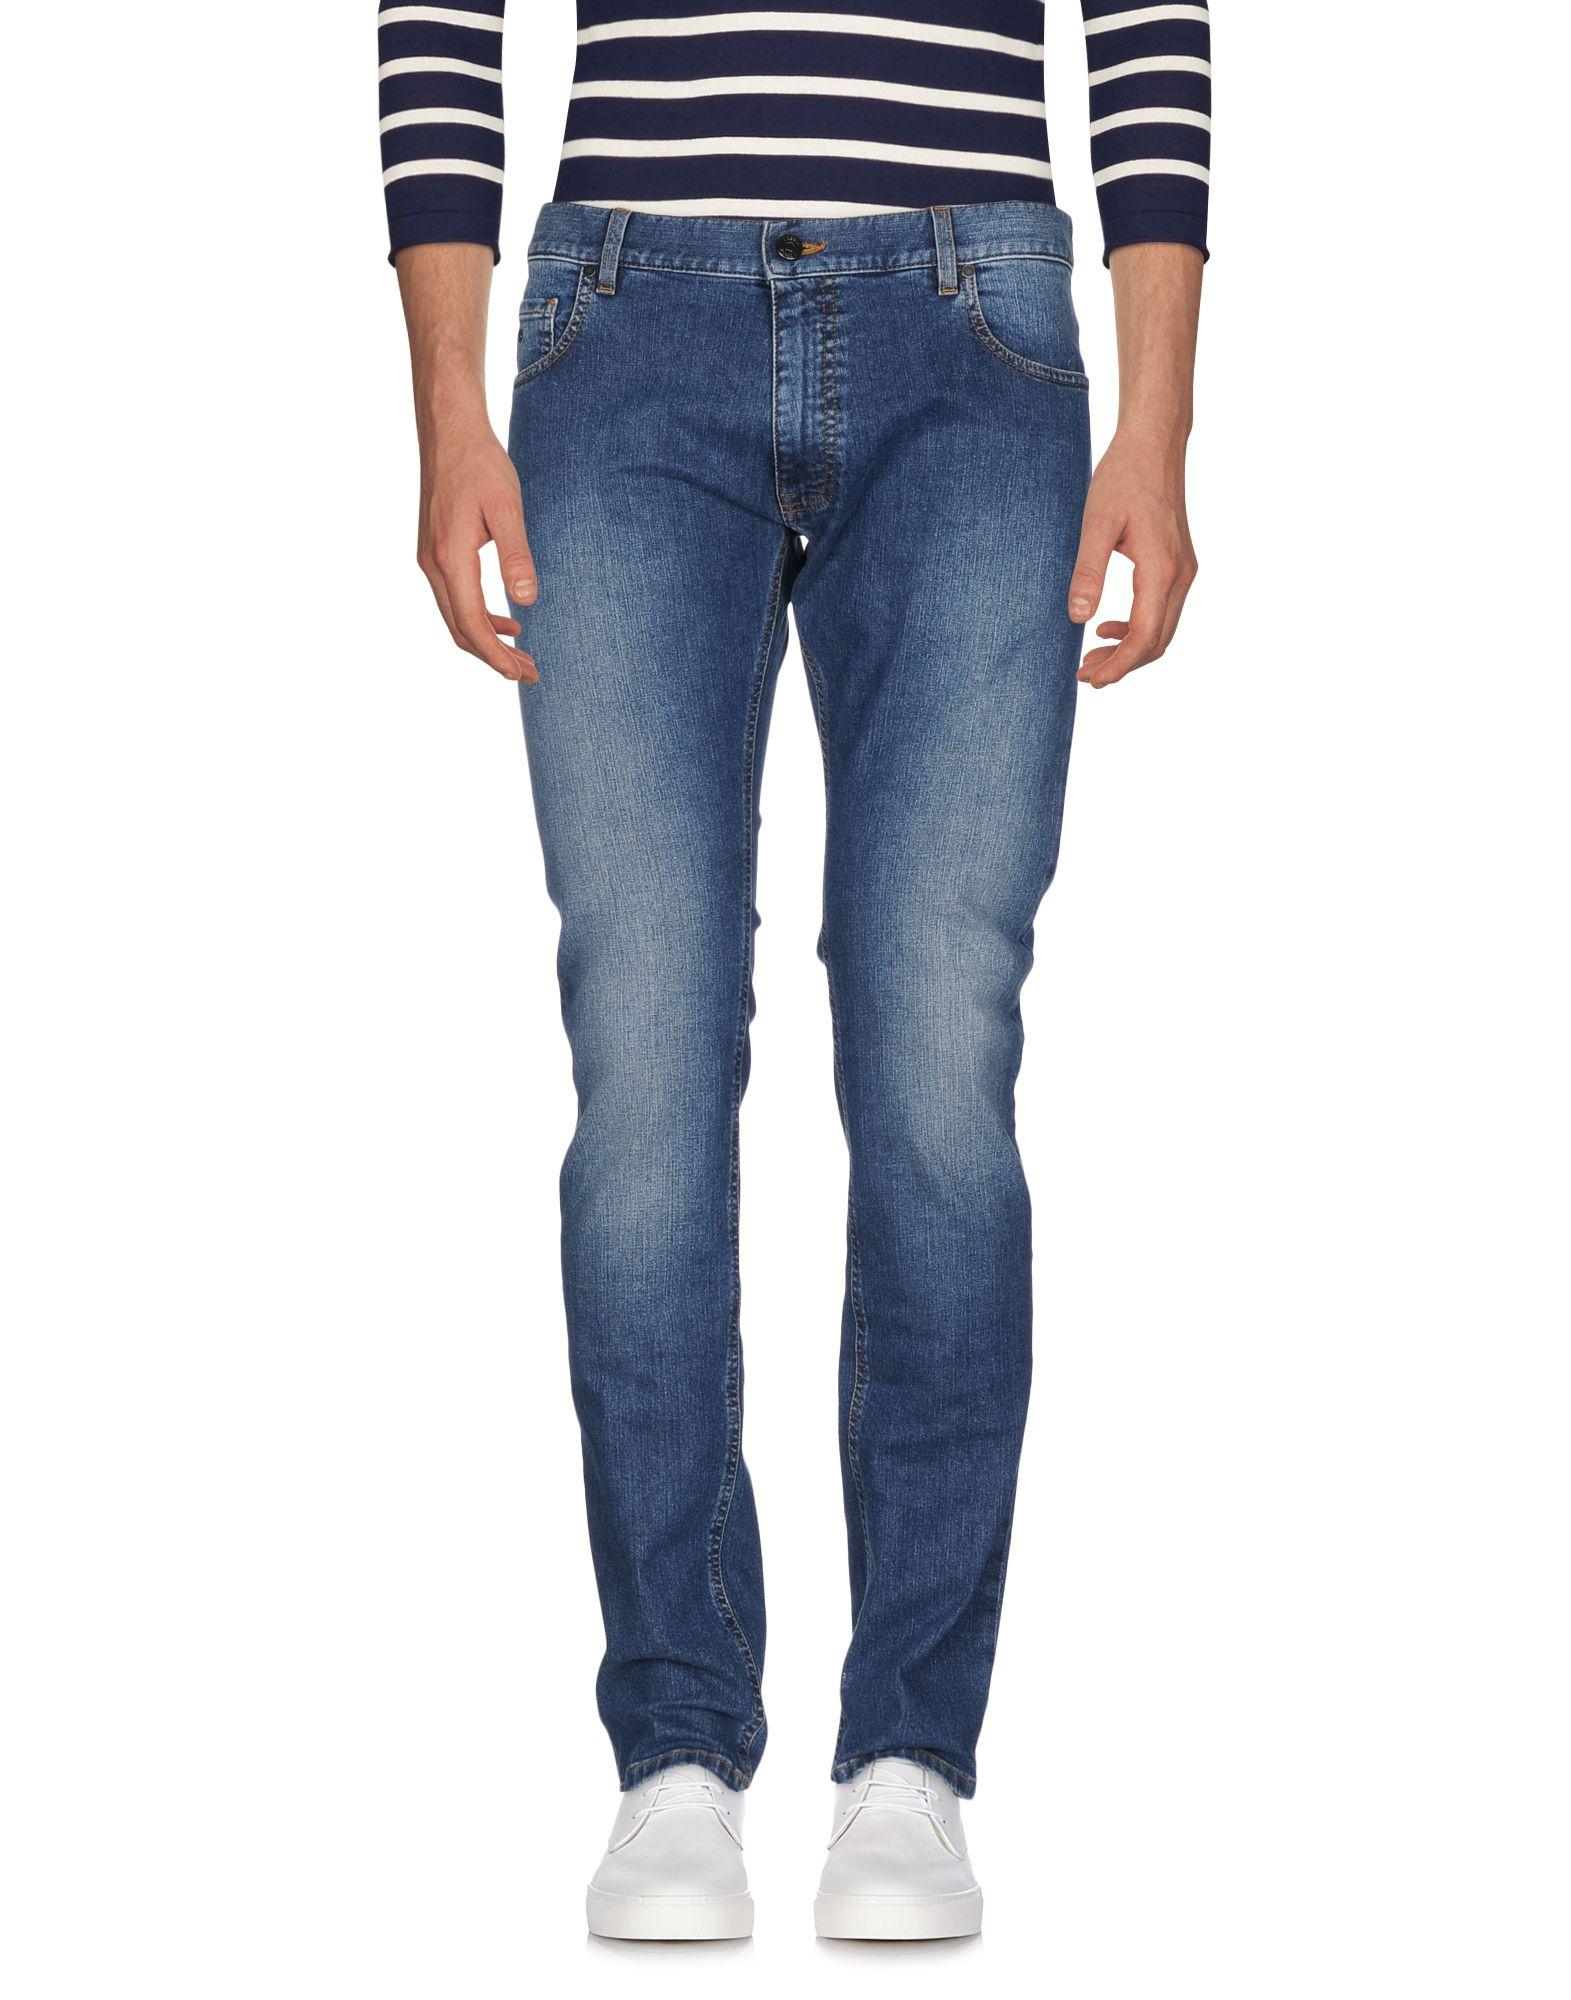 Pantaloni Jeans Zzegna Zzegna Jeans Uomo - 42640744KA 065f23